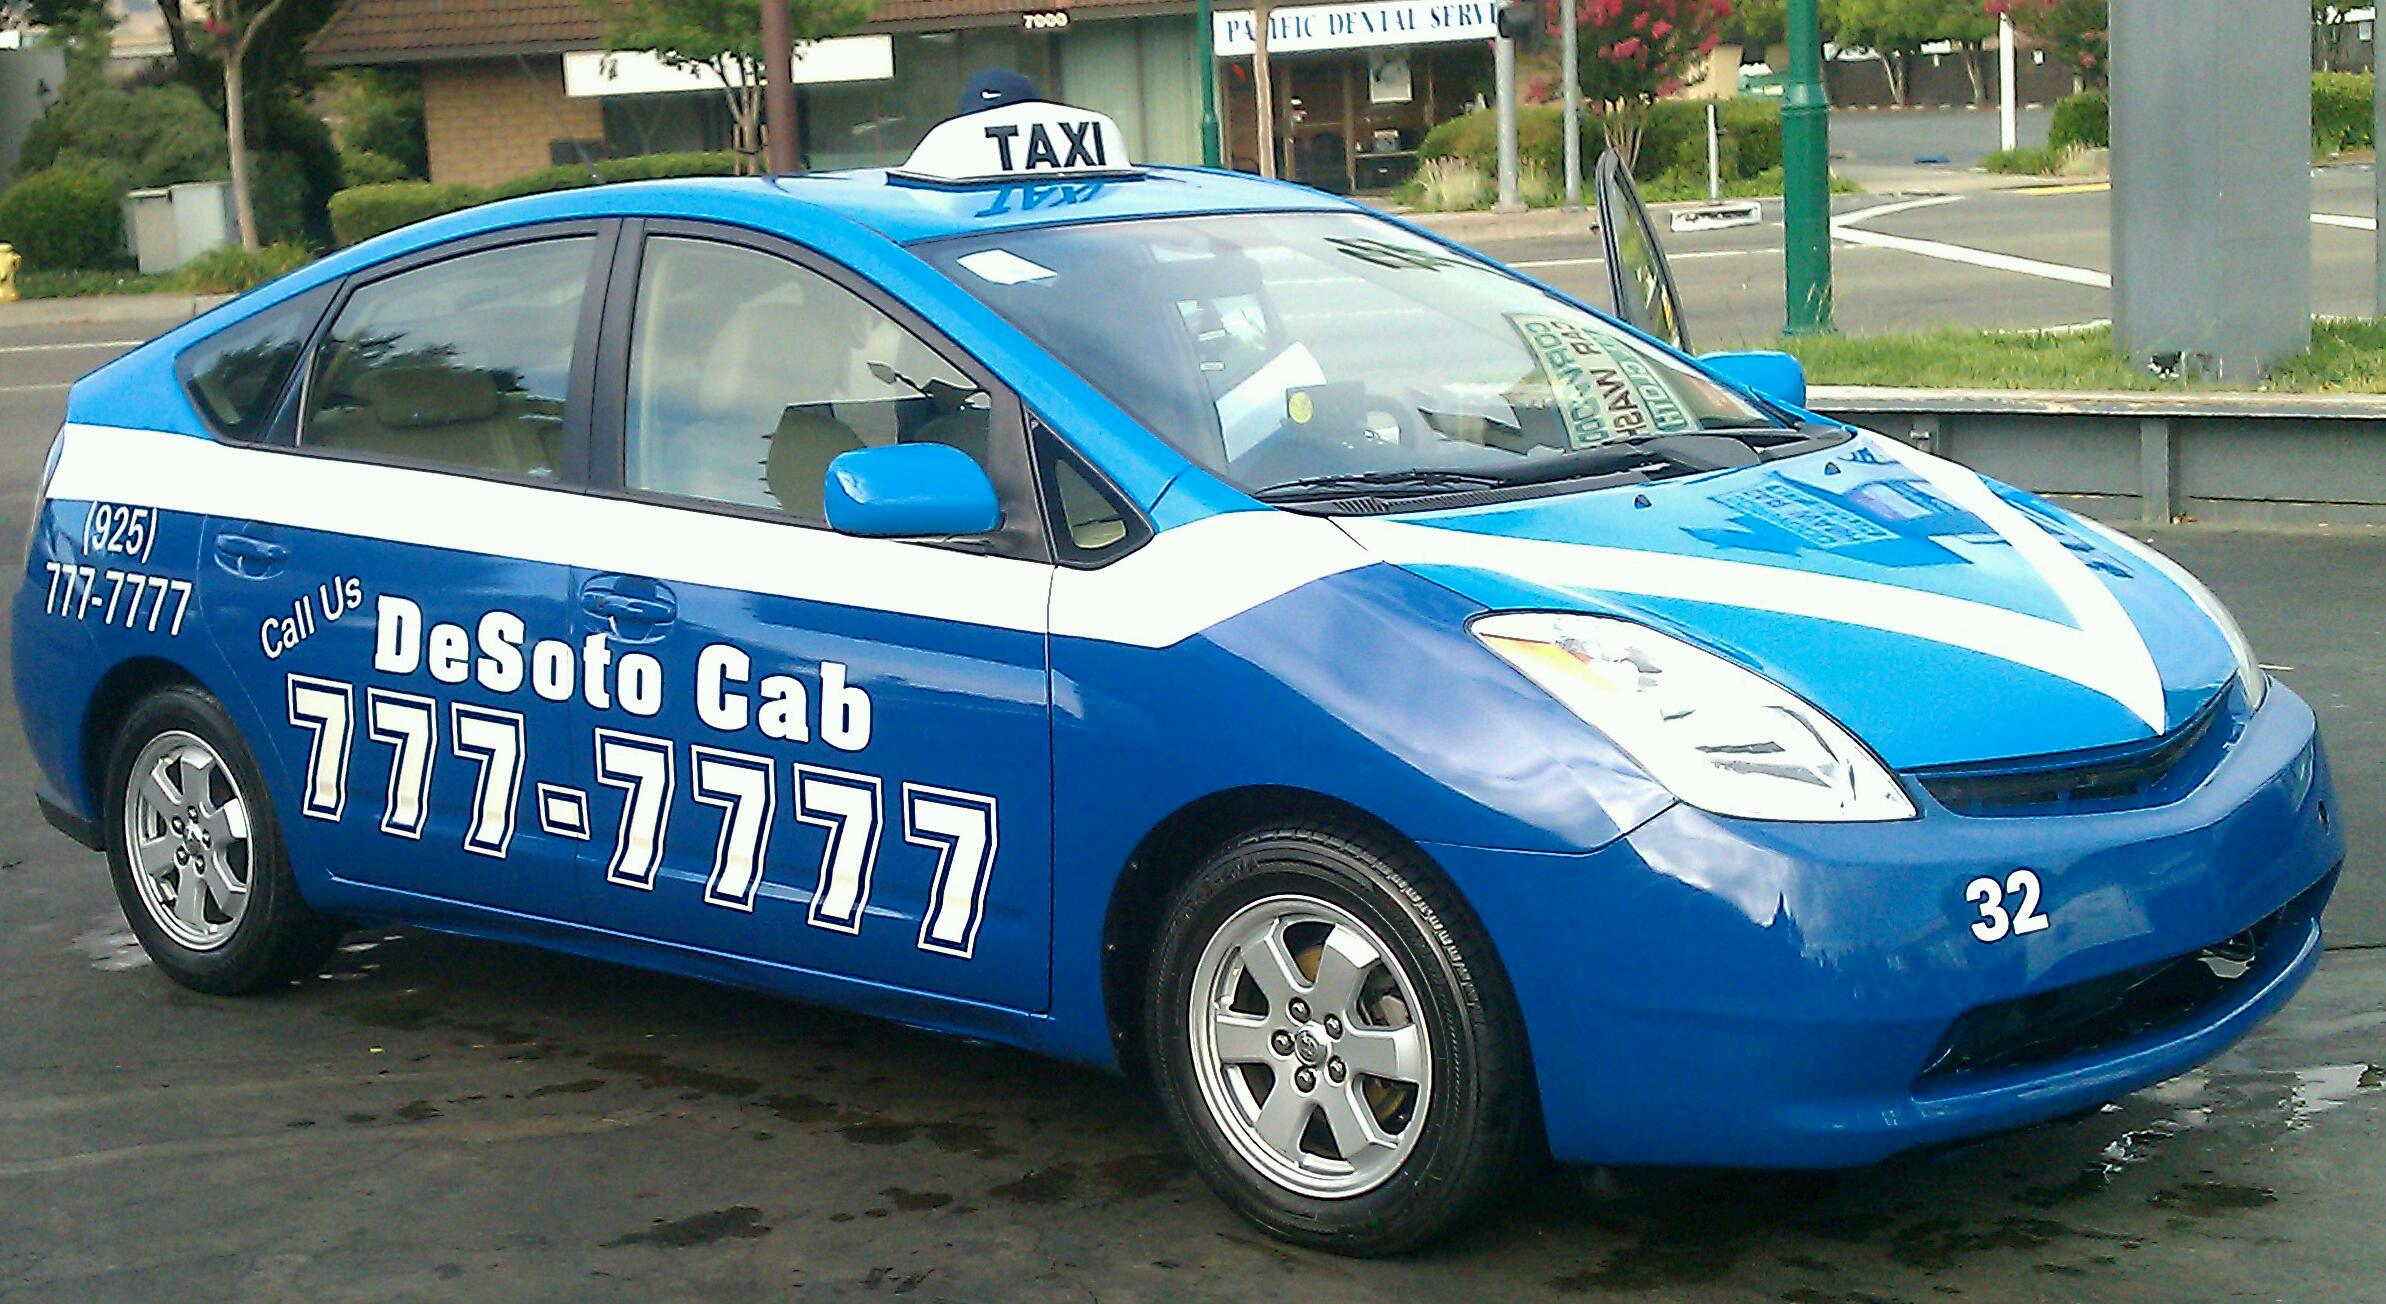 Dublin Taxi (925) 777-7777, 5777 Dublin blvd , Dublin, Ca, 94568, USA